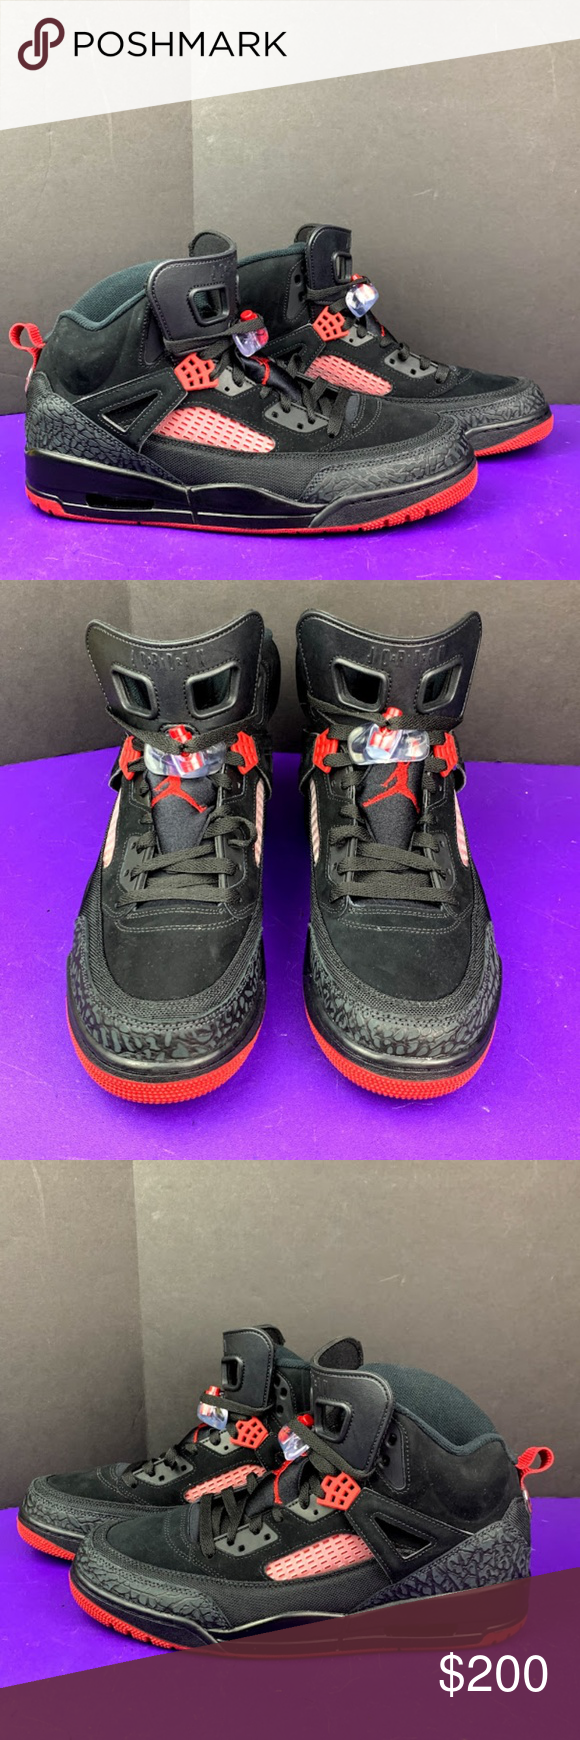 buy popular 3eeee eb4c1 Jordan SPIZIKE Basketball Shoes Black Gym Red Jordan SPIZIKE Basketball Shoes  Black Gym Red Anthracite